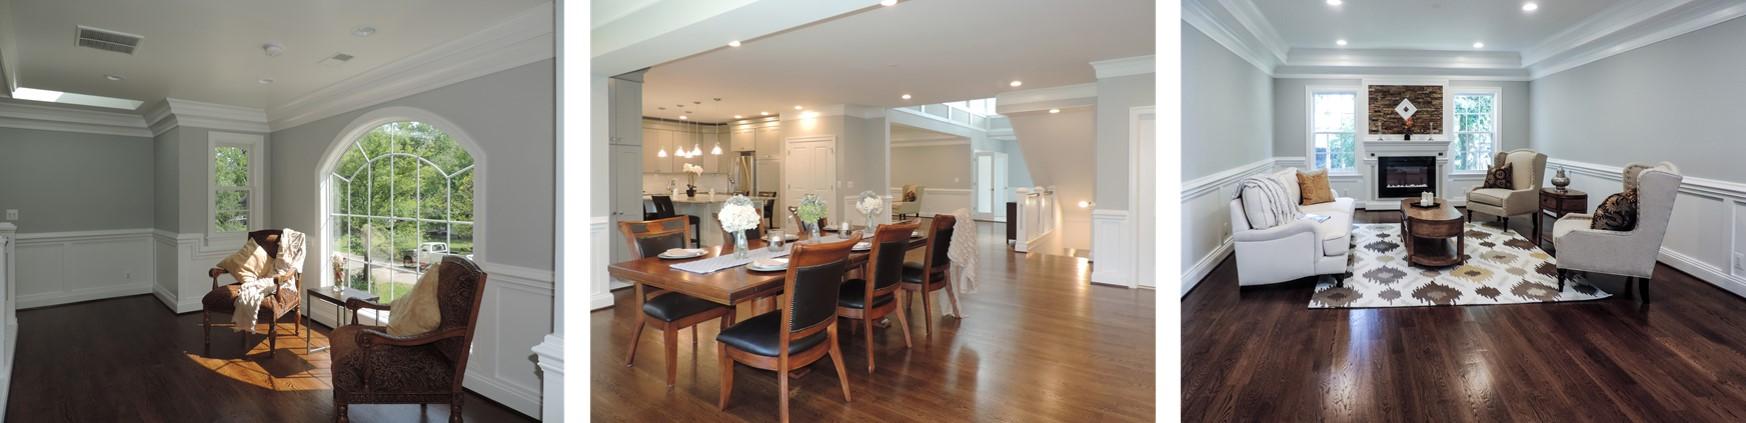 Custom Home Builder Northern Virginia, including Fairfax and Alexandria.